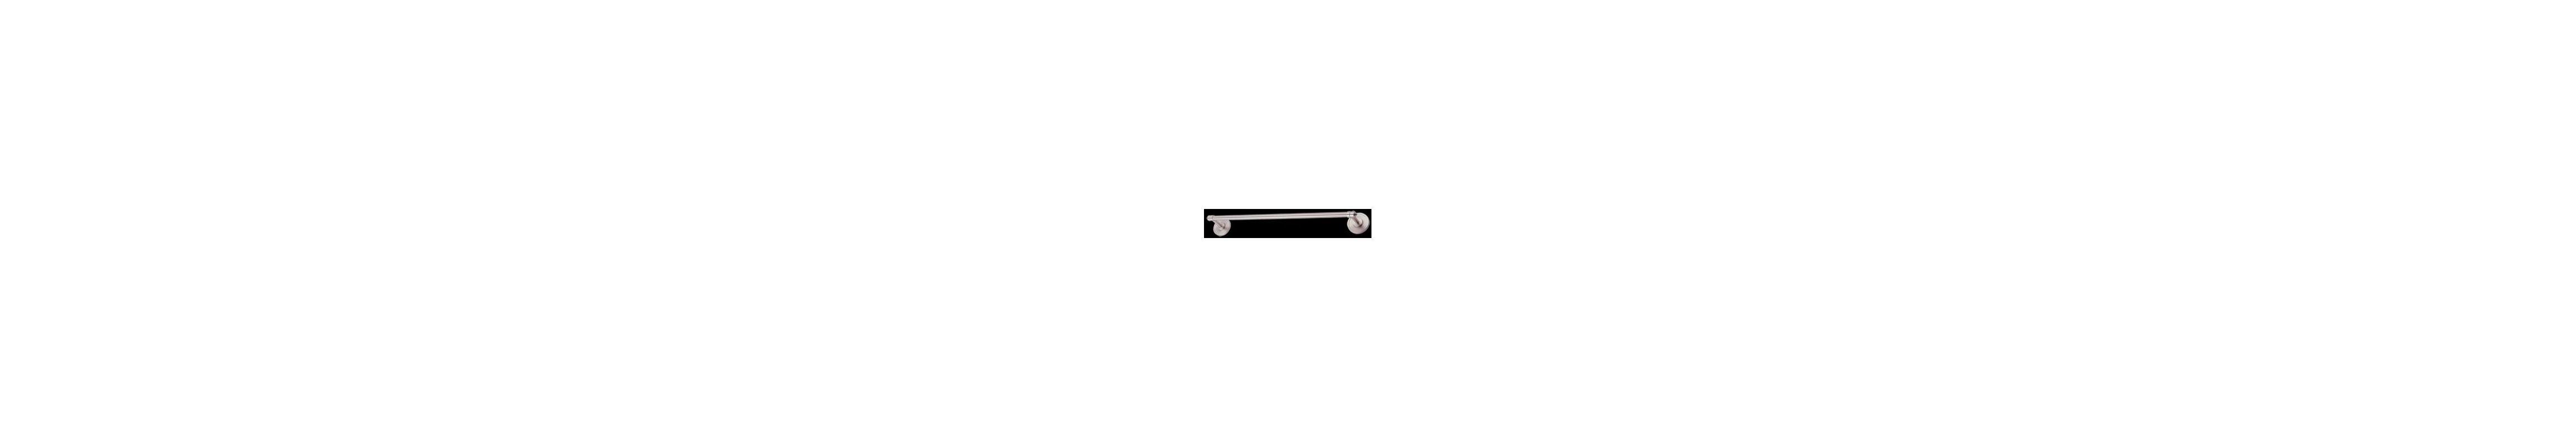 "DVI Lighting DVP3682 3 Light 30"" Towel Bar from the Dominion"